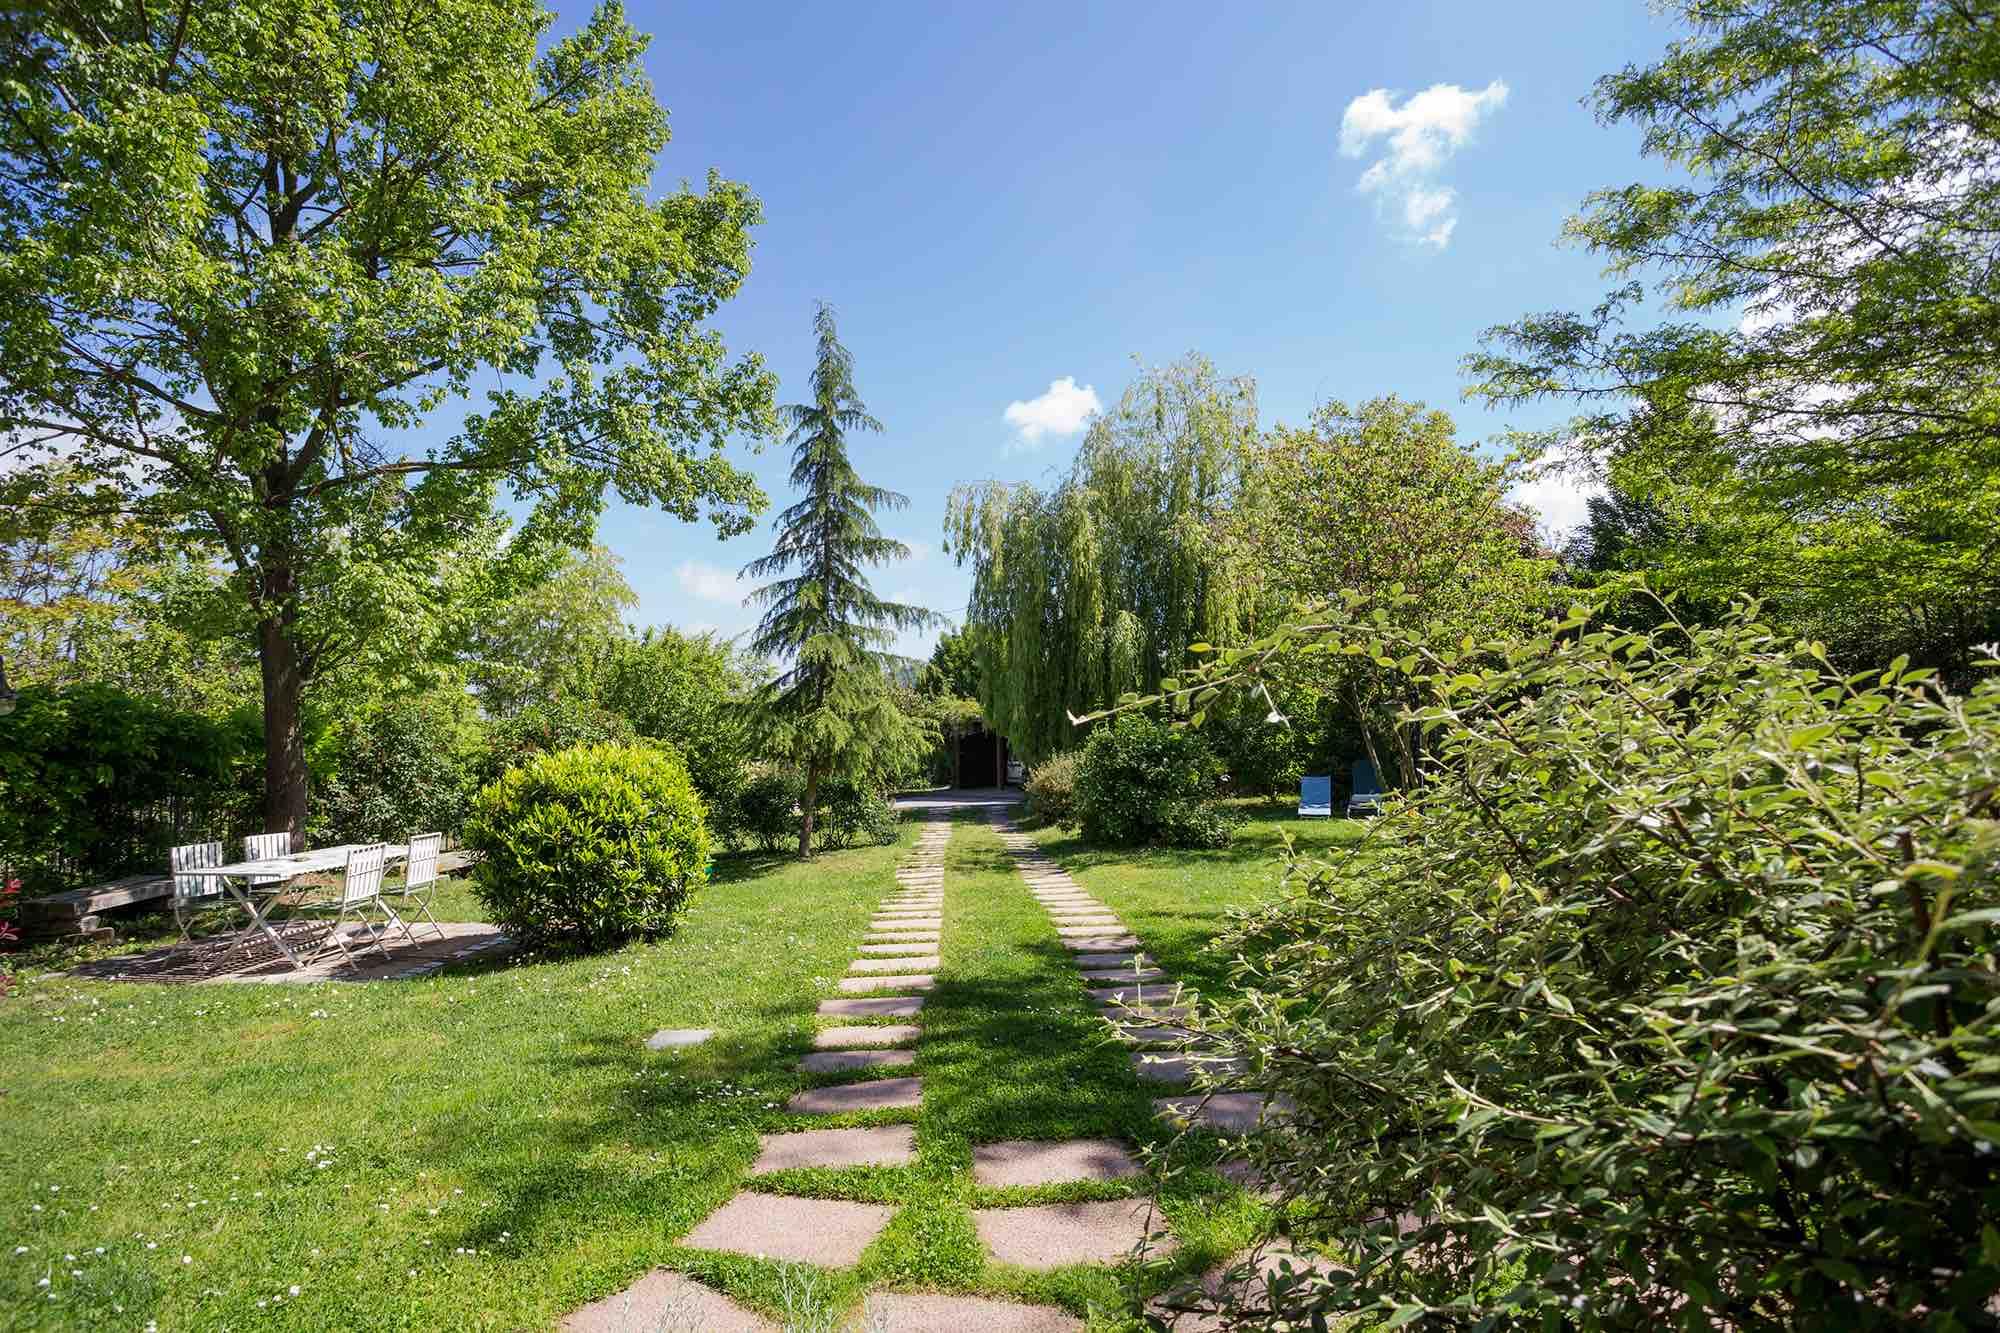 B&B_TorredeiMagnani_giardino